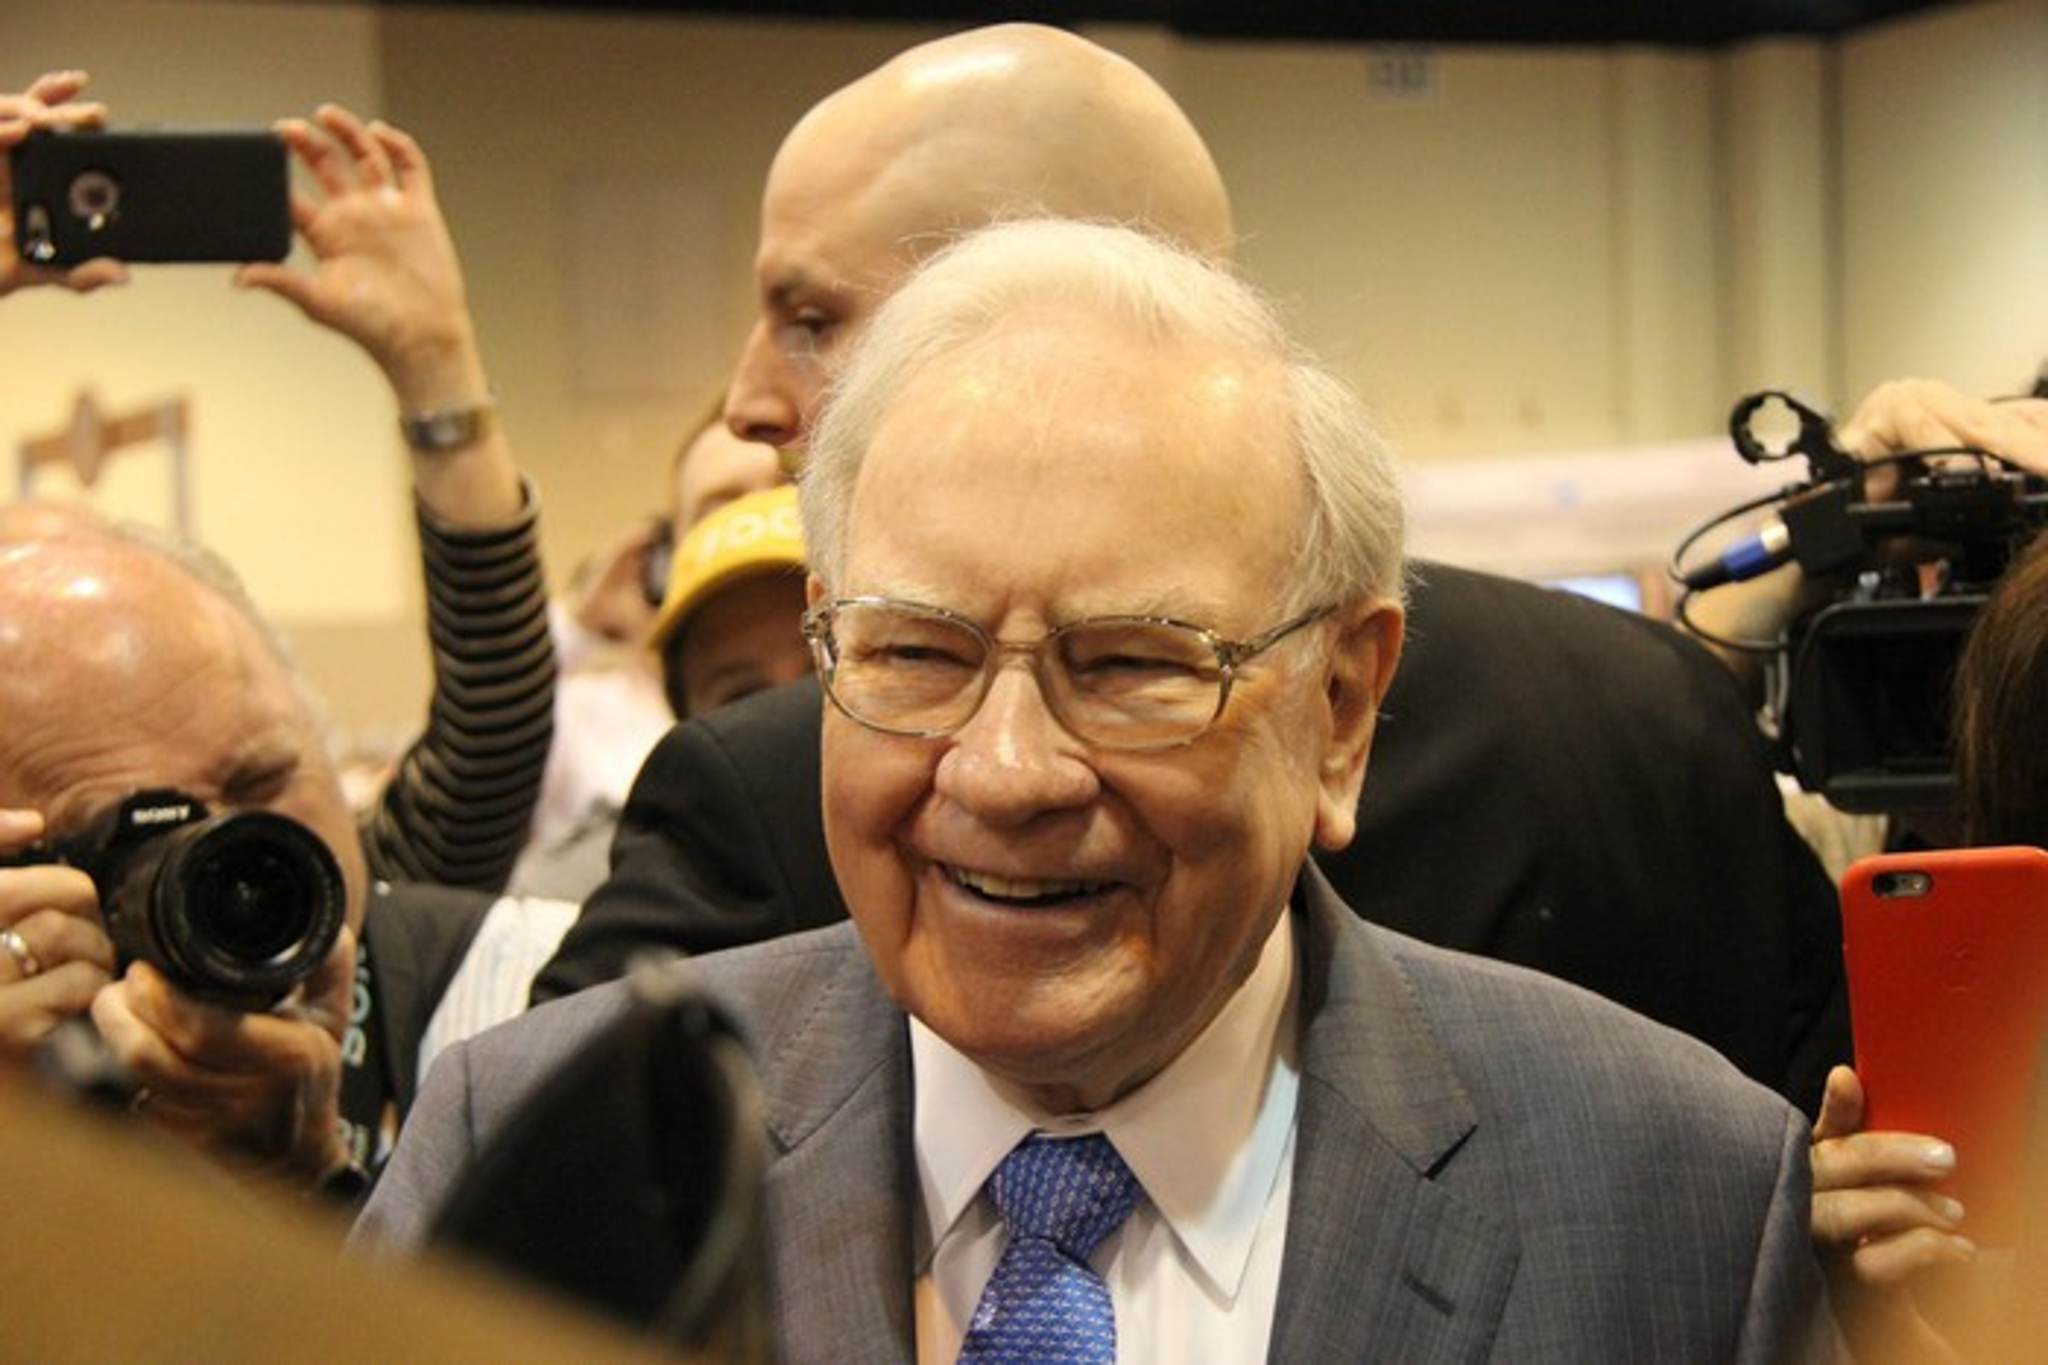 Warren Buffett smiling for pictures.